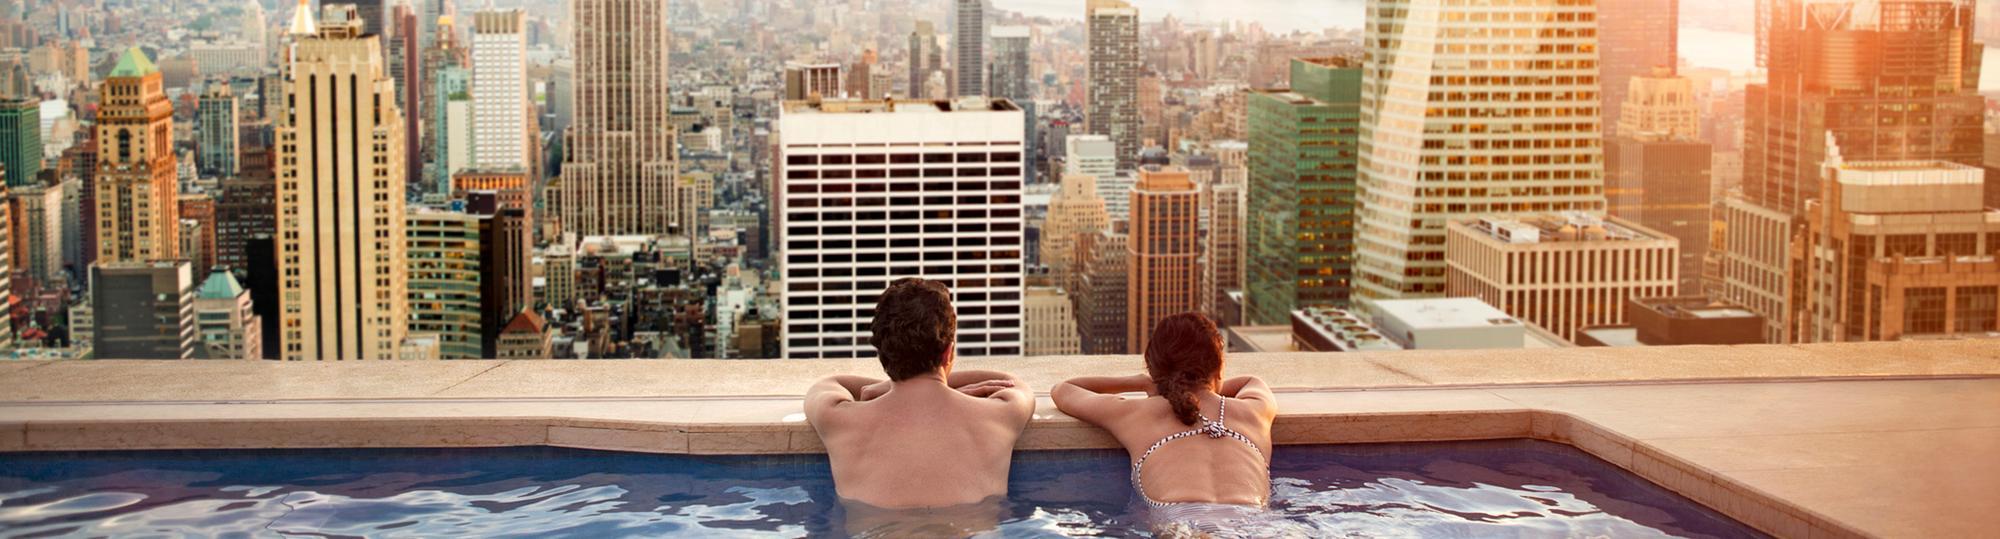 tryp deal hero couple in hotel pool